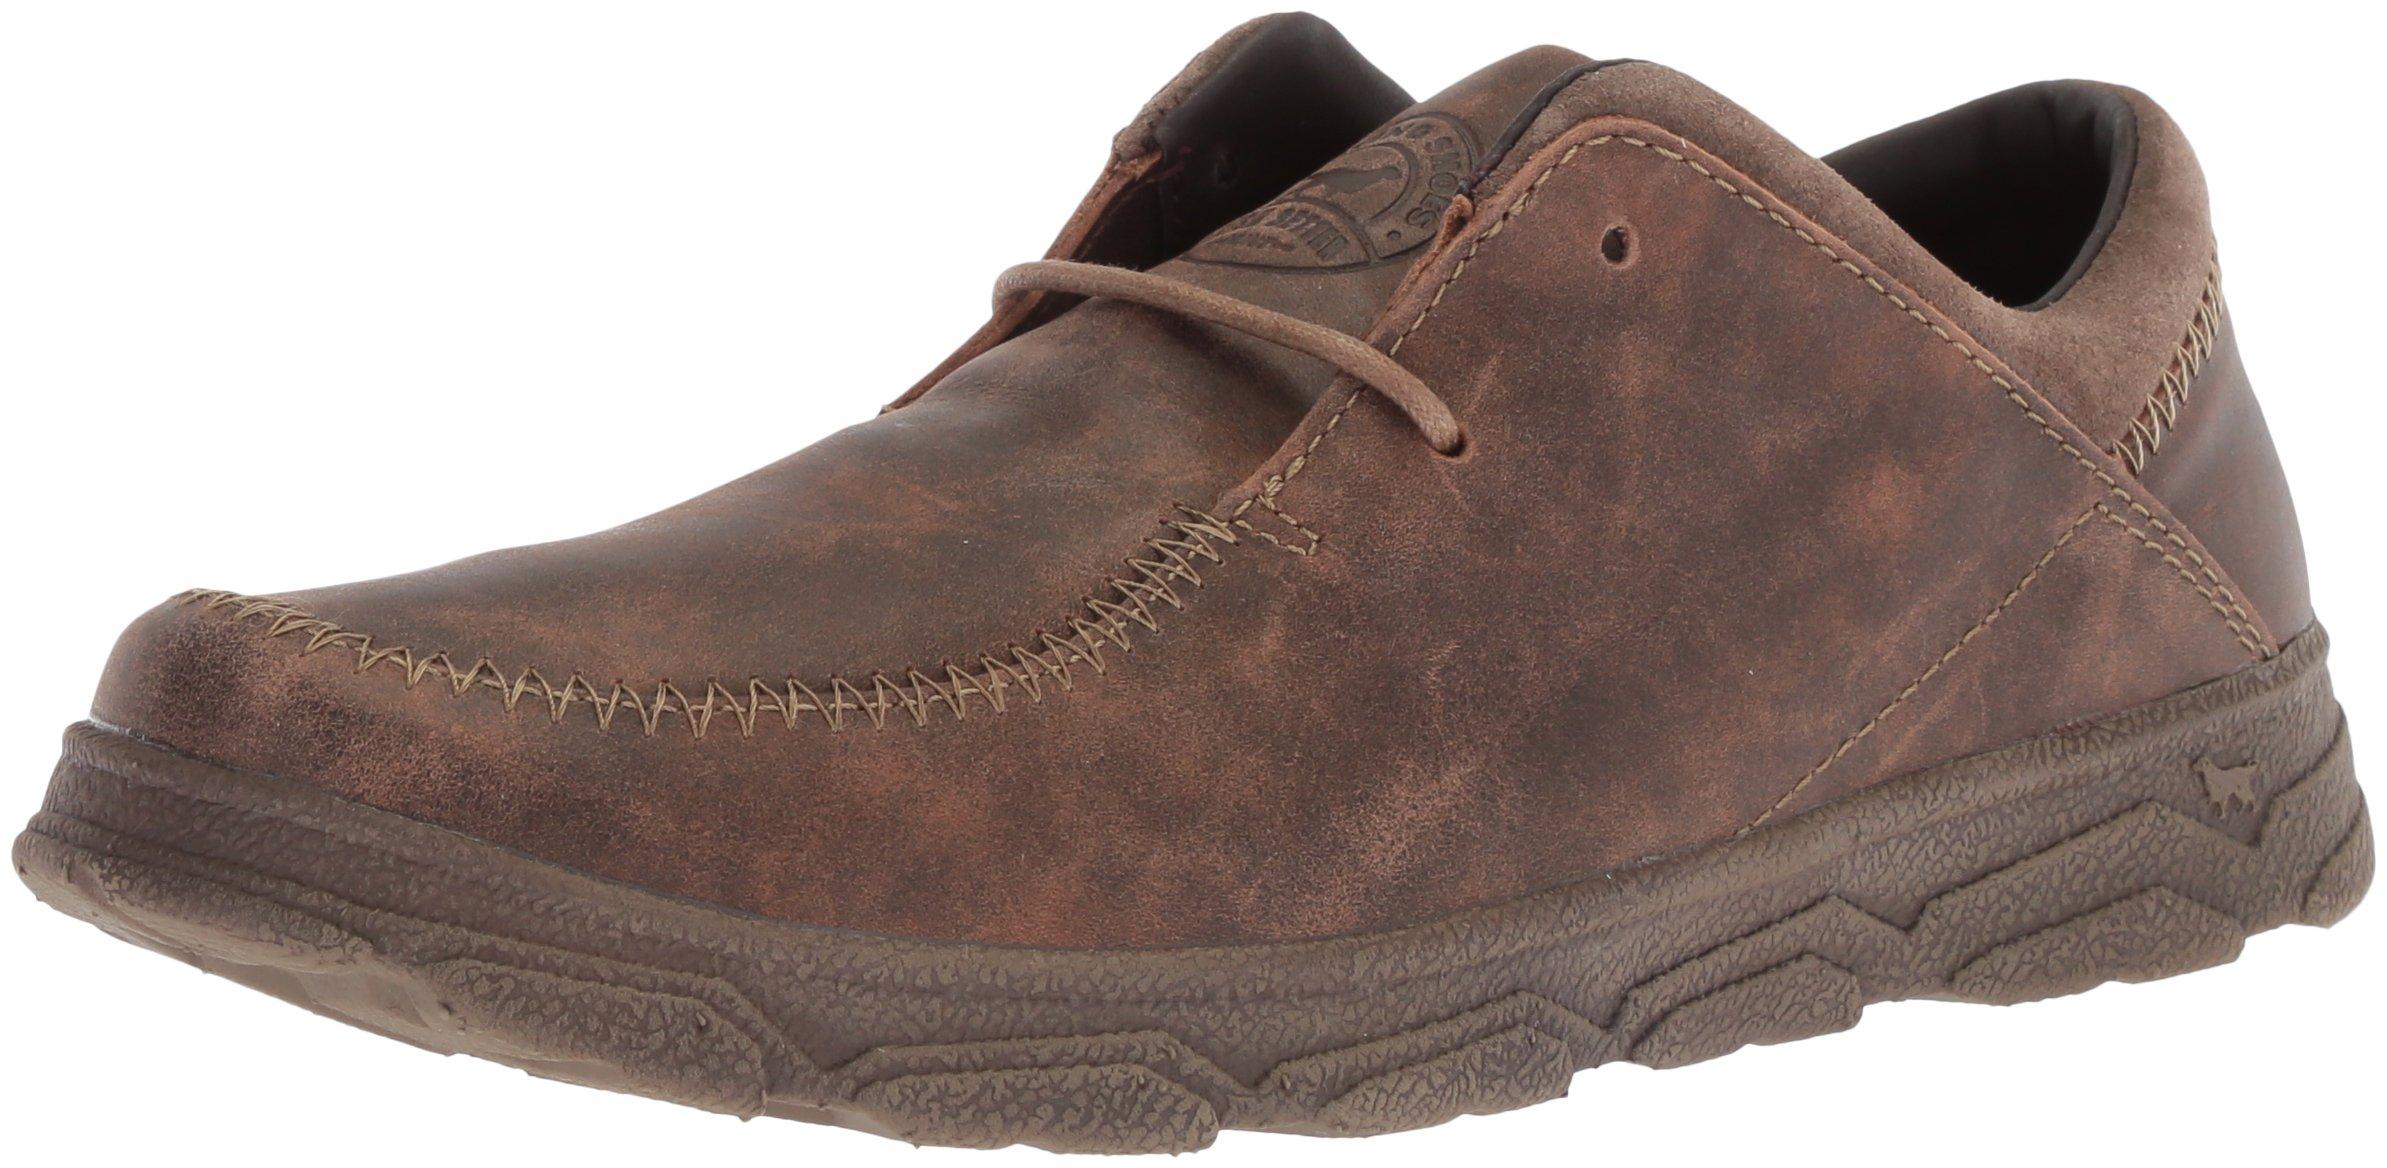 Irish Setter Men's Traveler 3806 Oxford Boot, Brown, 11 2E US by Irish Setter